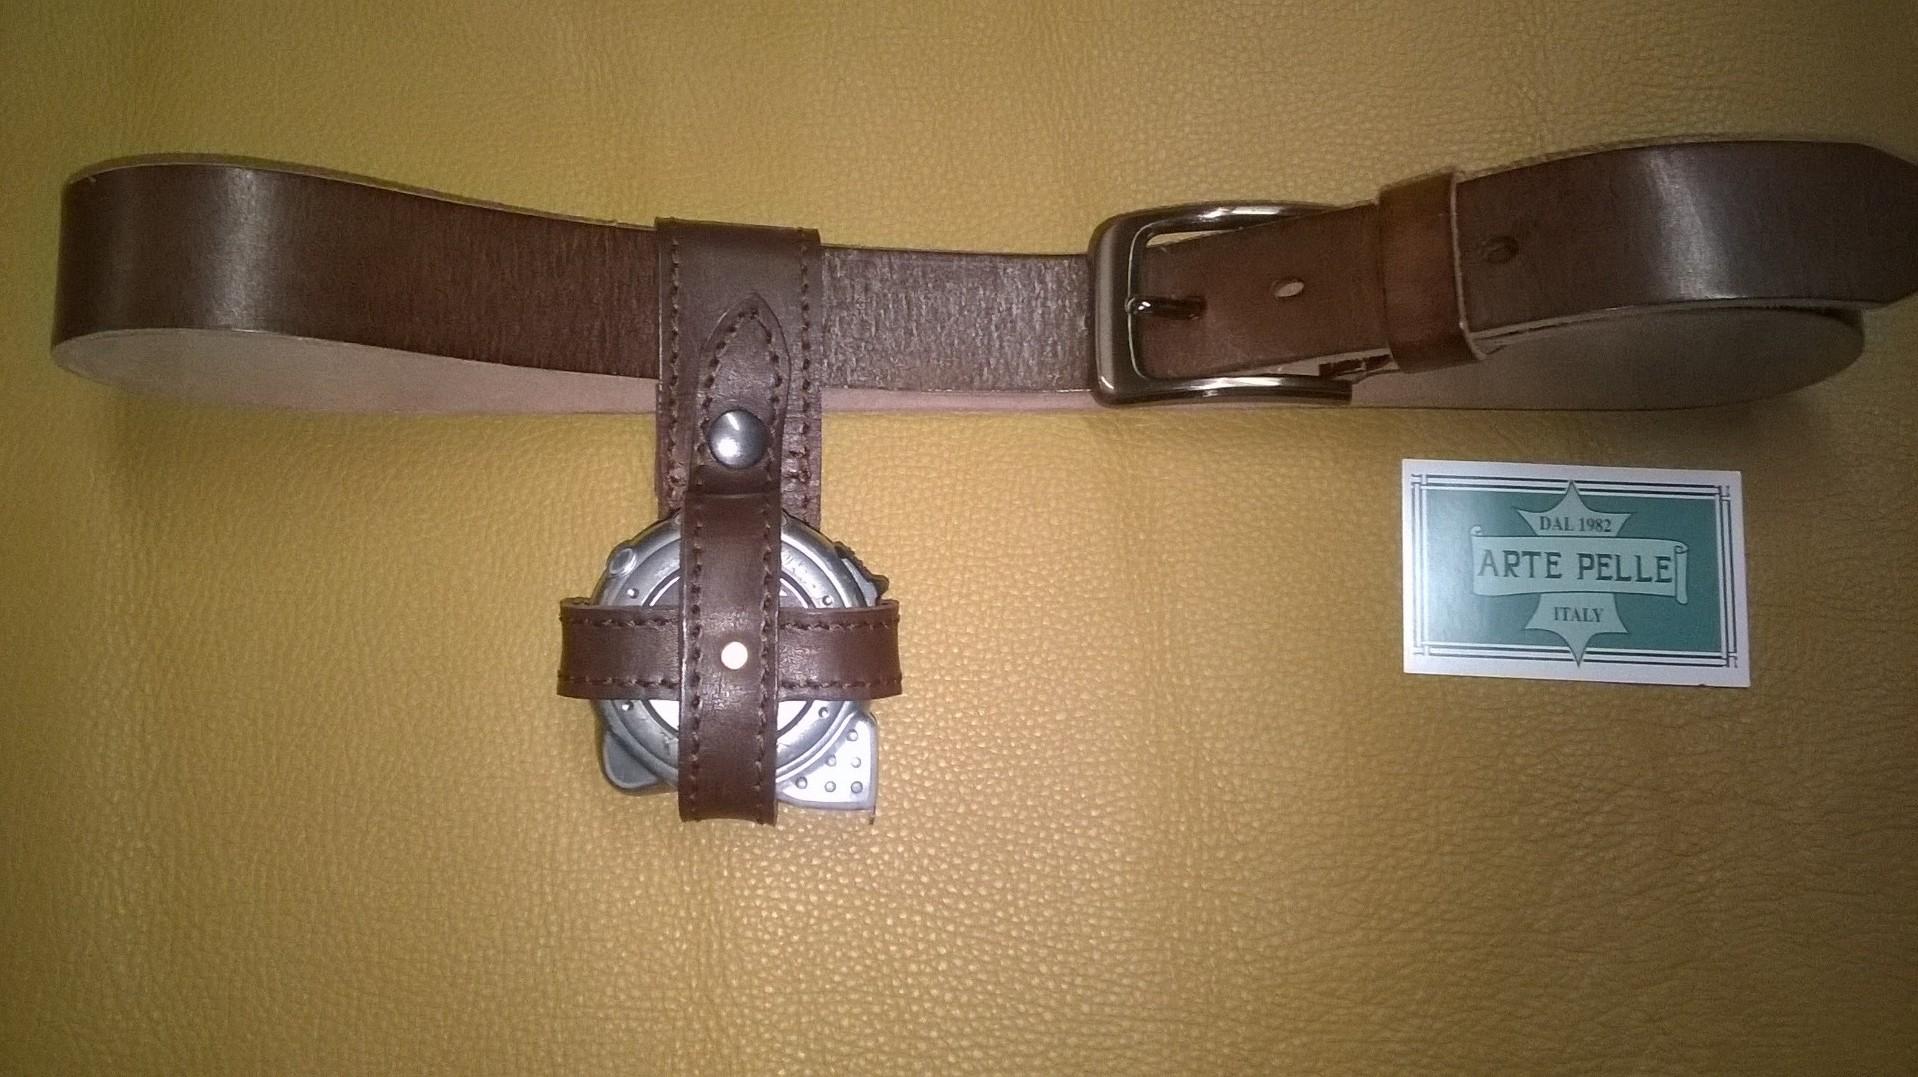 Porta metro per cintura arte pelle italia - Porta metro da cintura ...